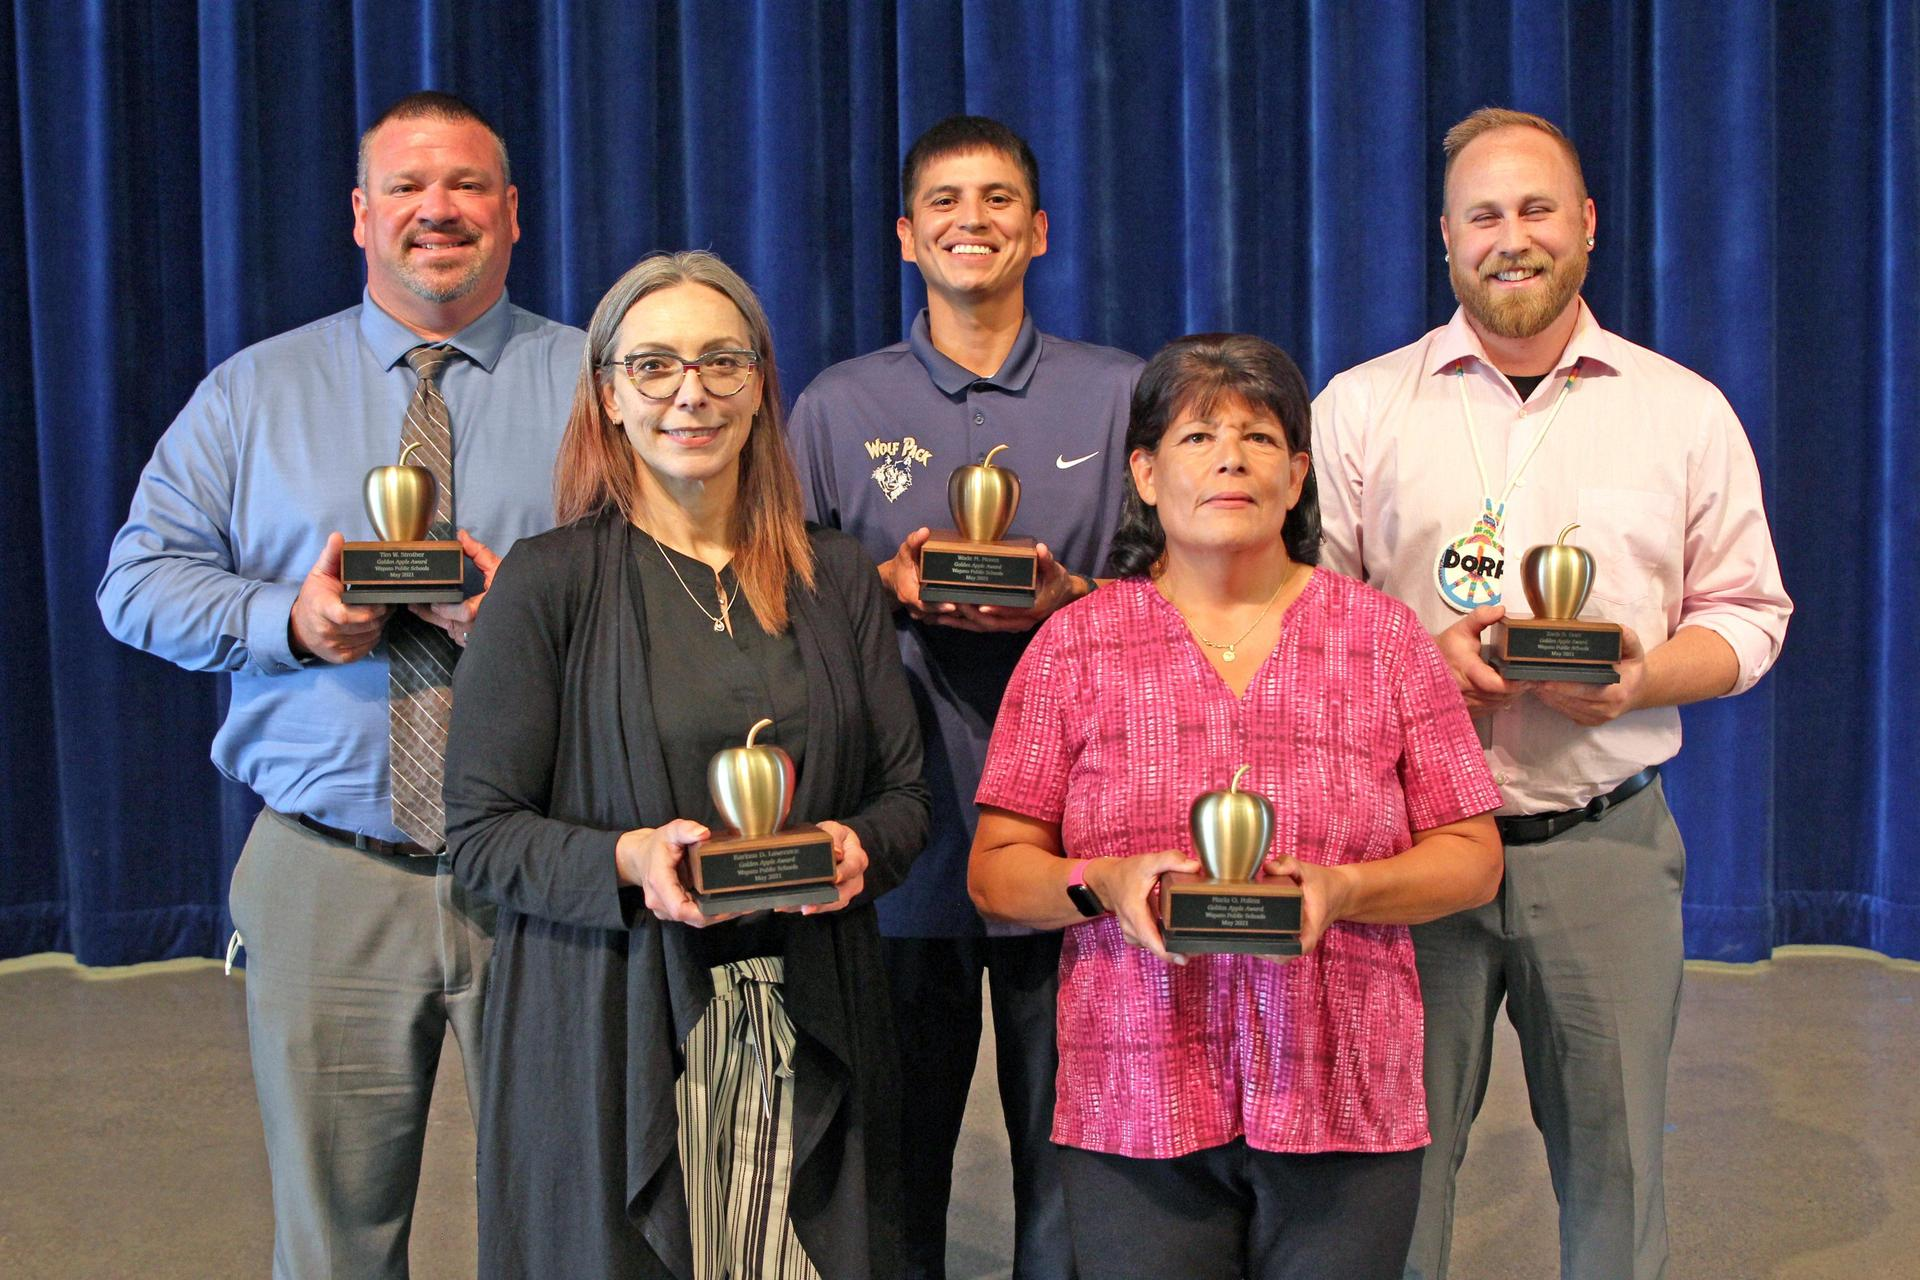 5 staff members holding golden apple awards